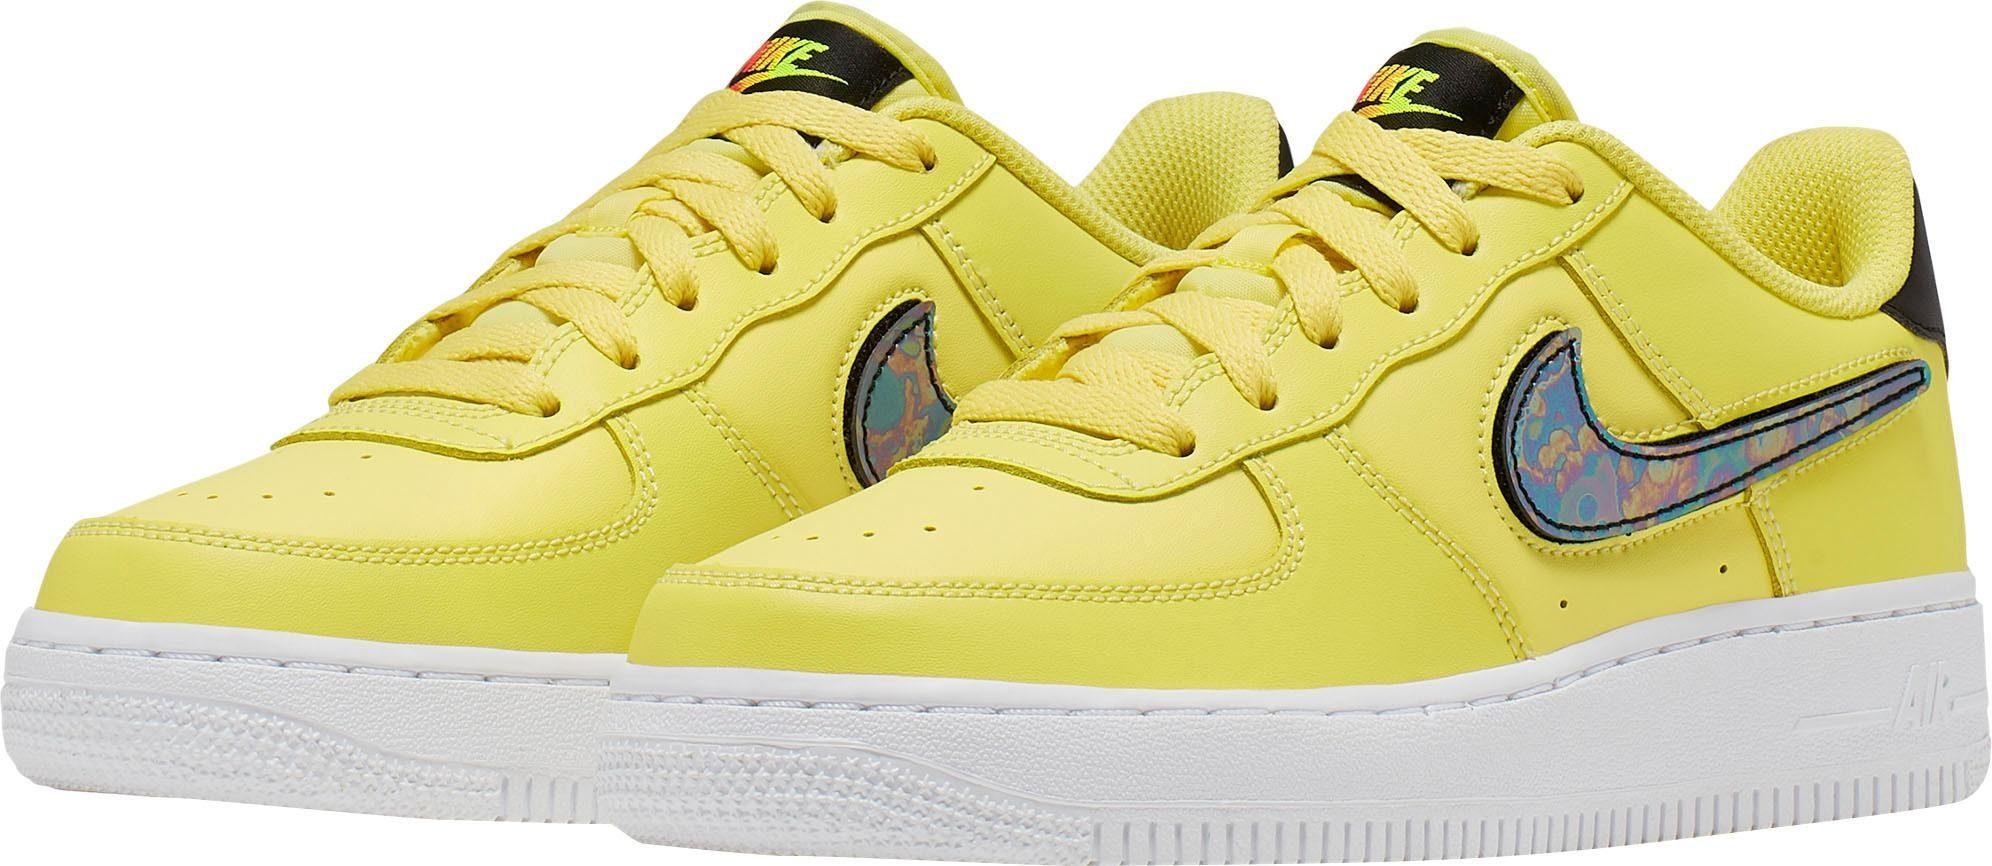 Nike Sportswear »AIR FORCE 1 LV8 3 BG« Sneaker | OTTO